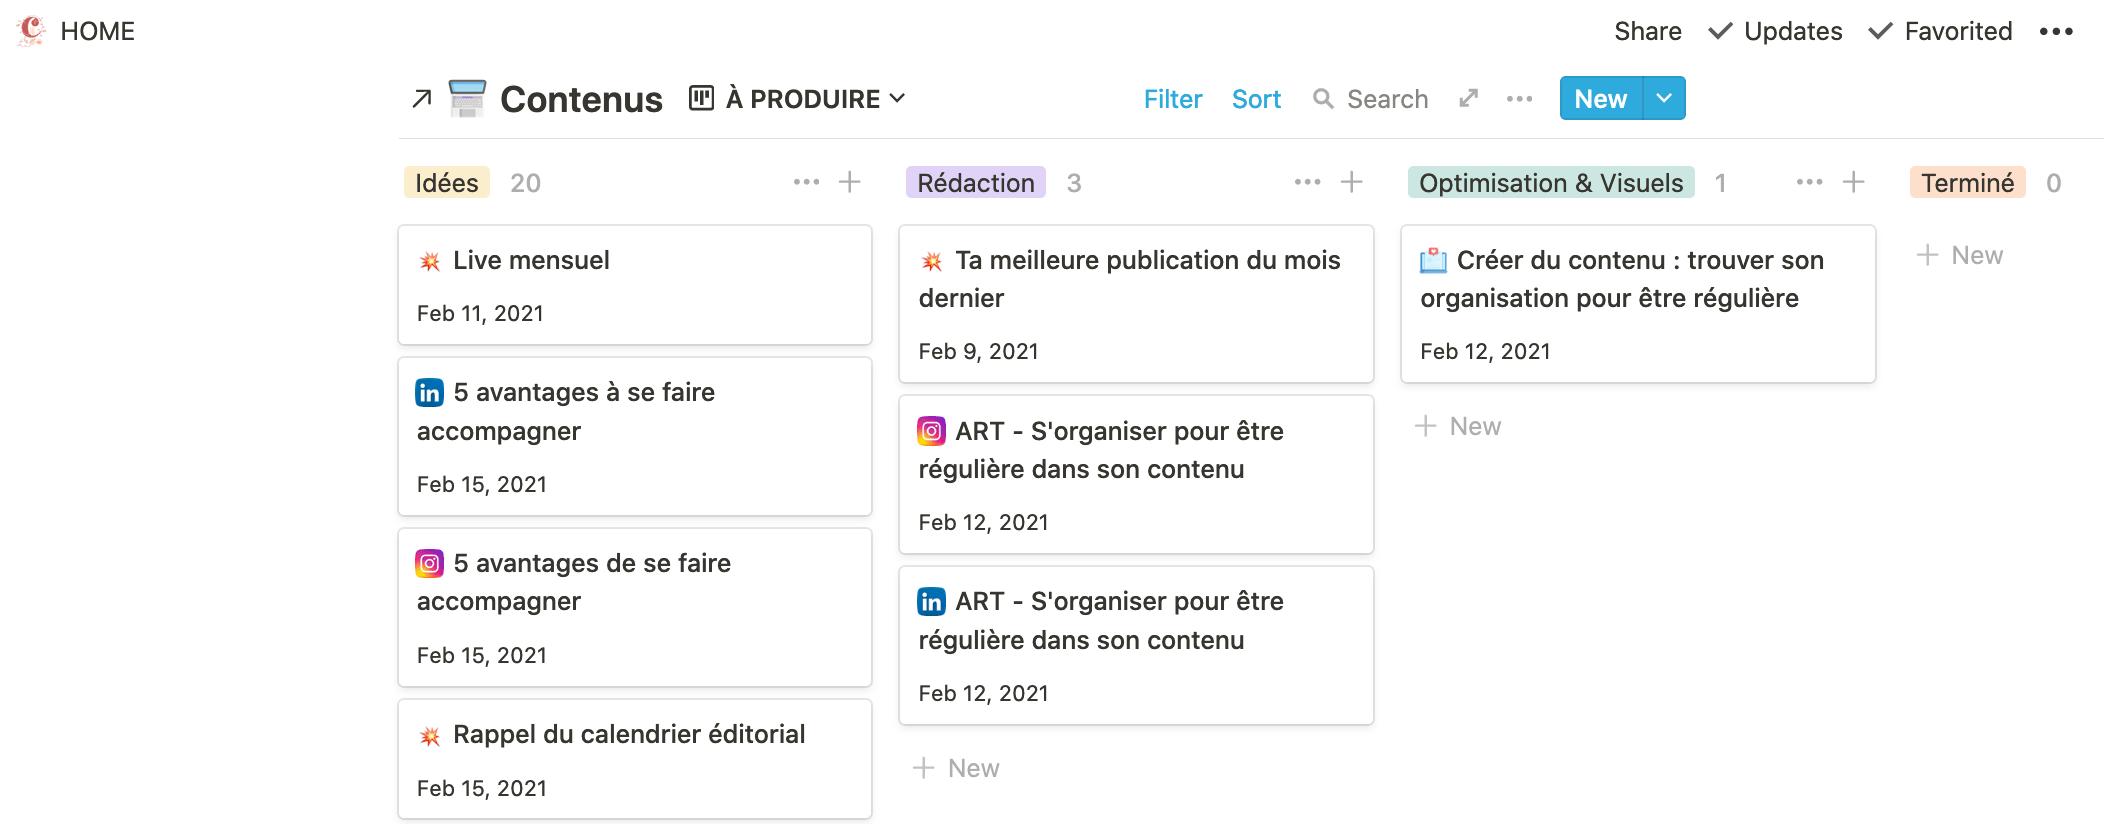 contenus-notion-board